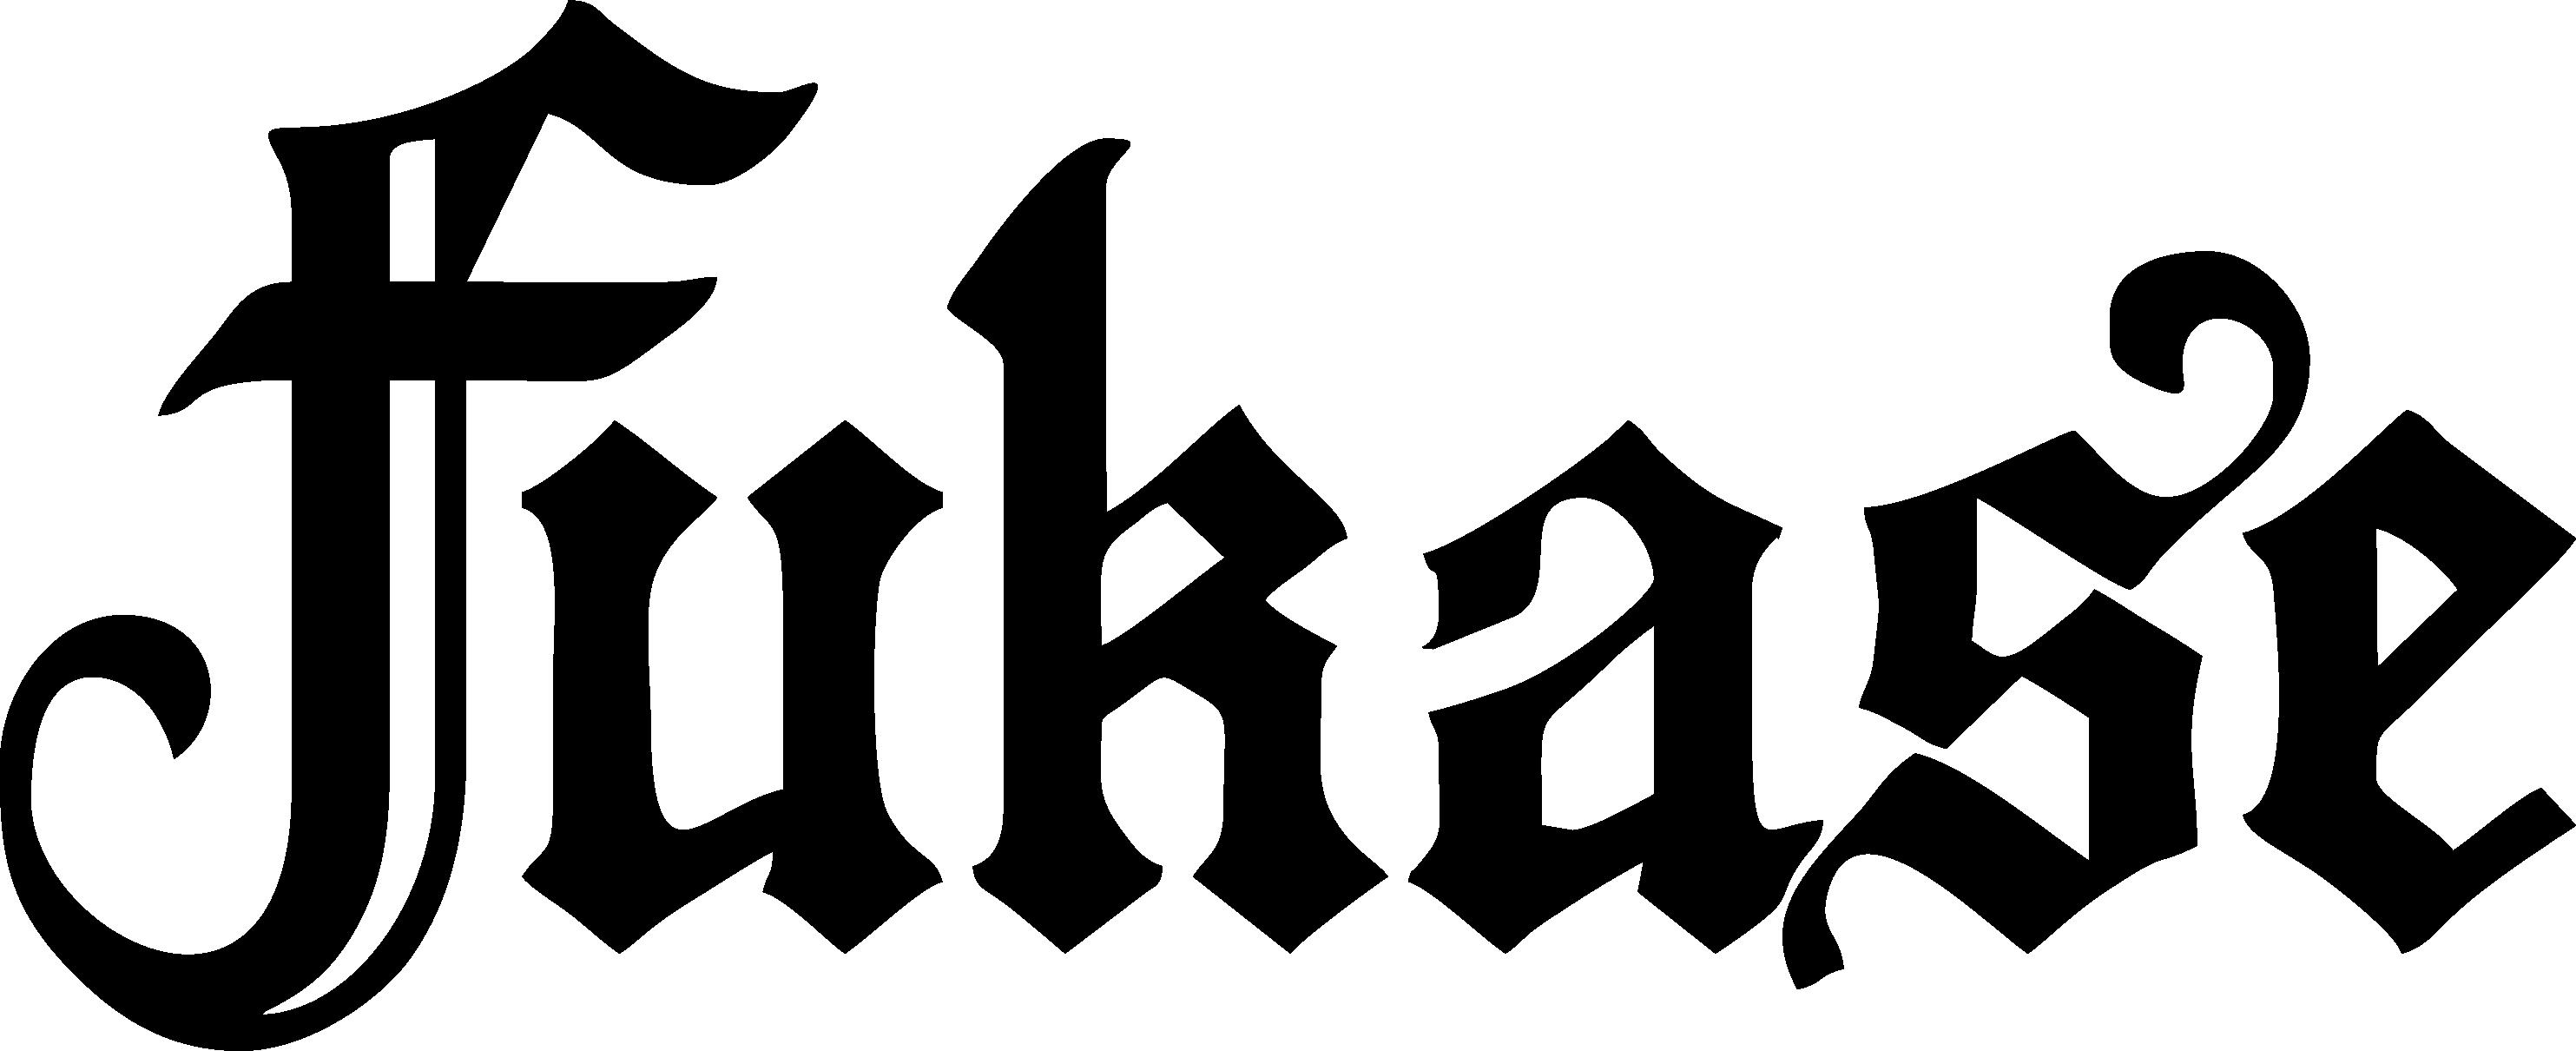 Fukase Logo Hd By Yukosanzv On Deviantart